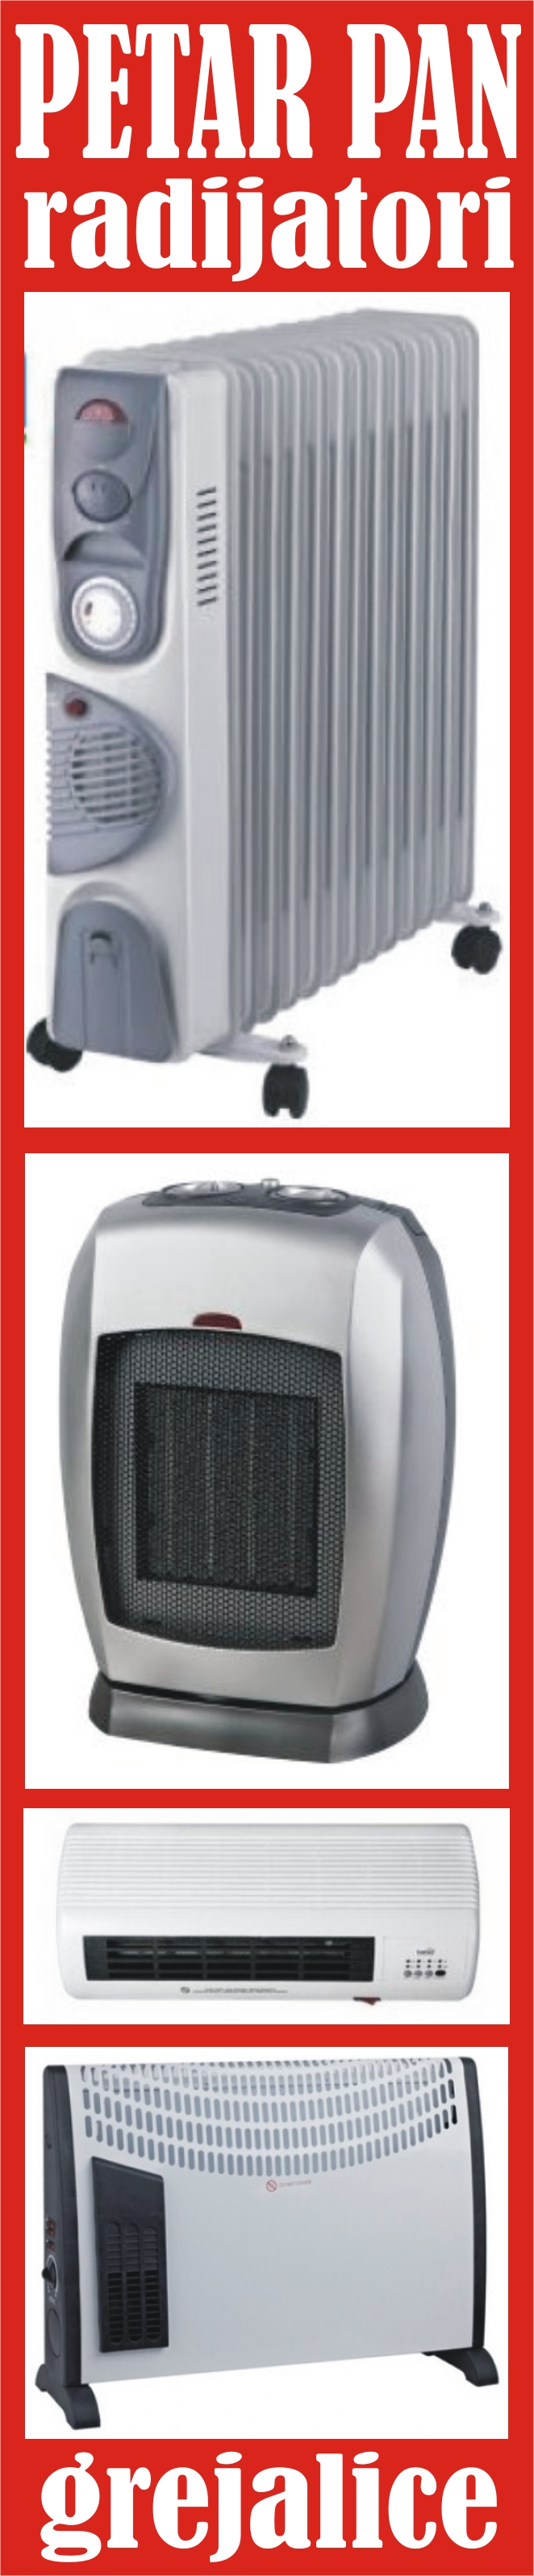 radijatori-reklama